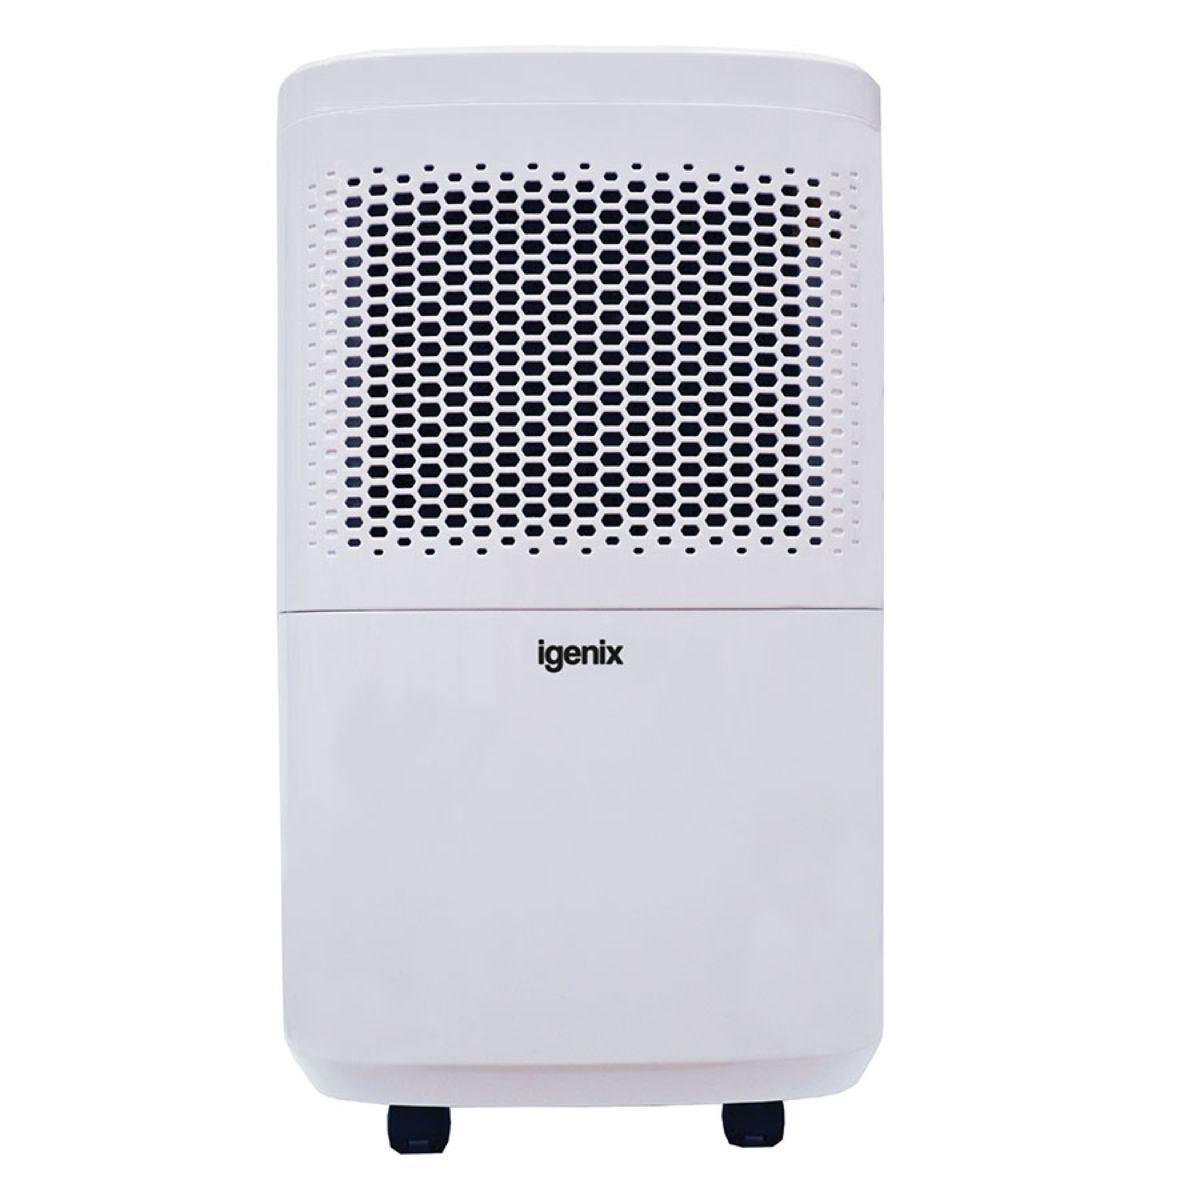 Igenix IG9813 12L Dehumidifier - White